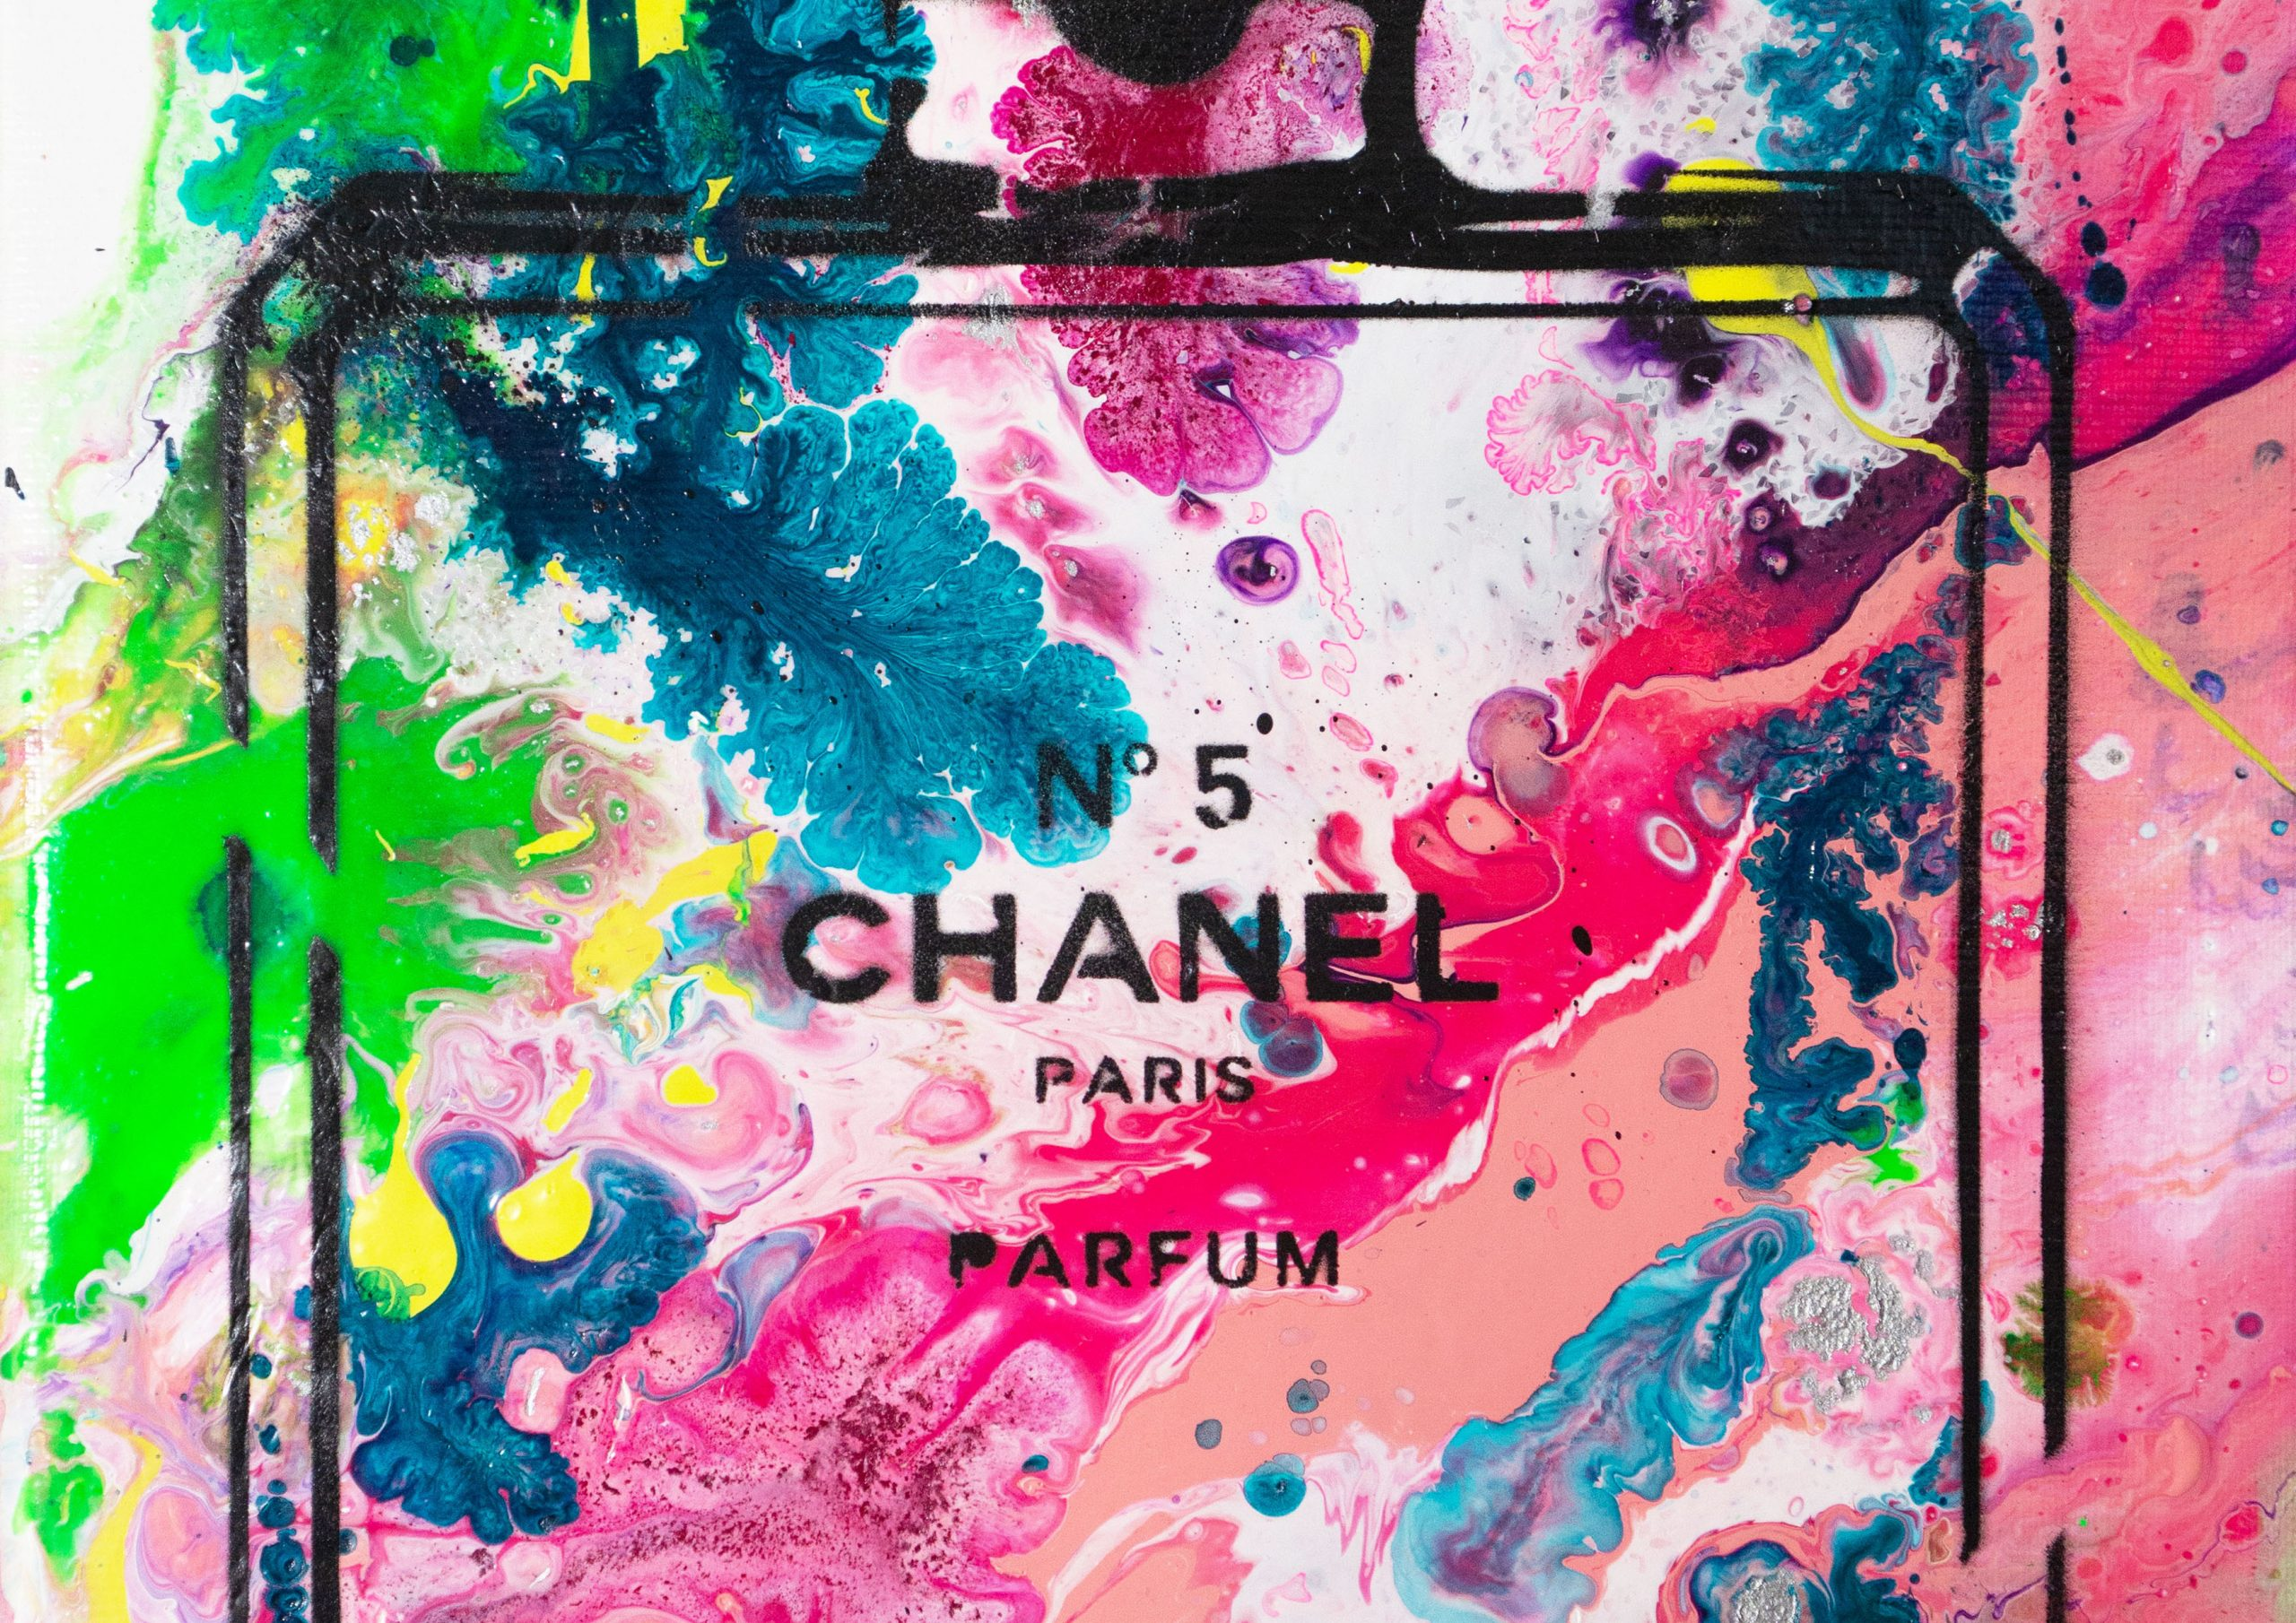 ART-PAINT-CHANEL-PERFUME-BOTANICAL-CANVAS-DETAIL